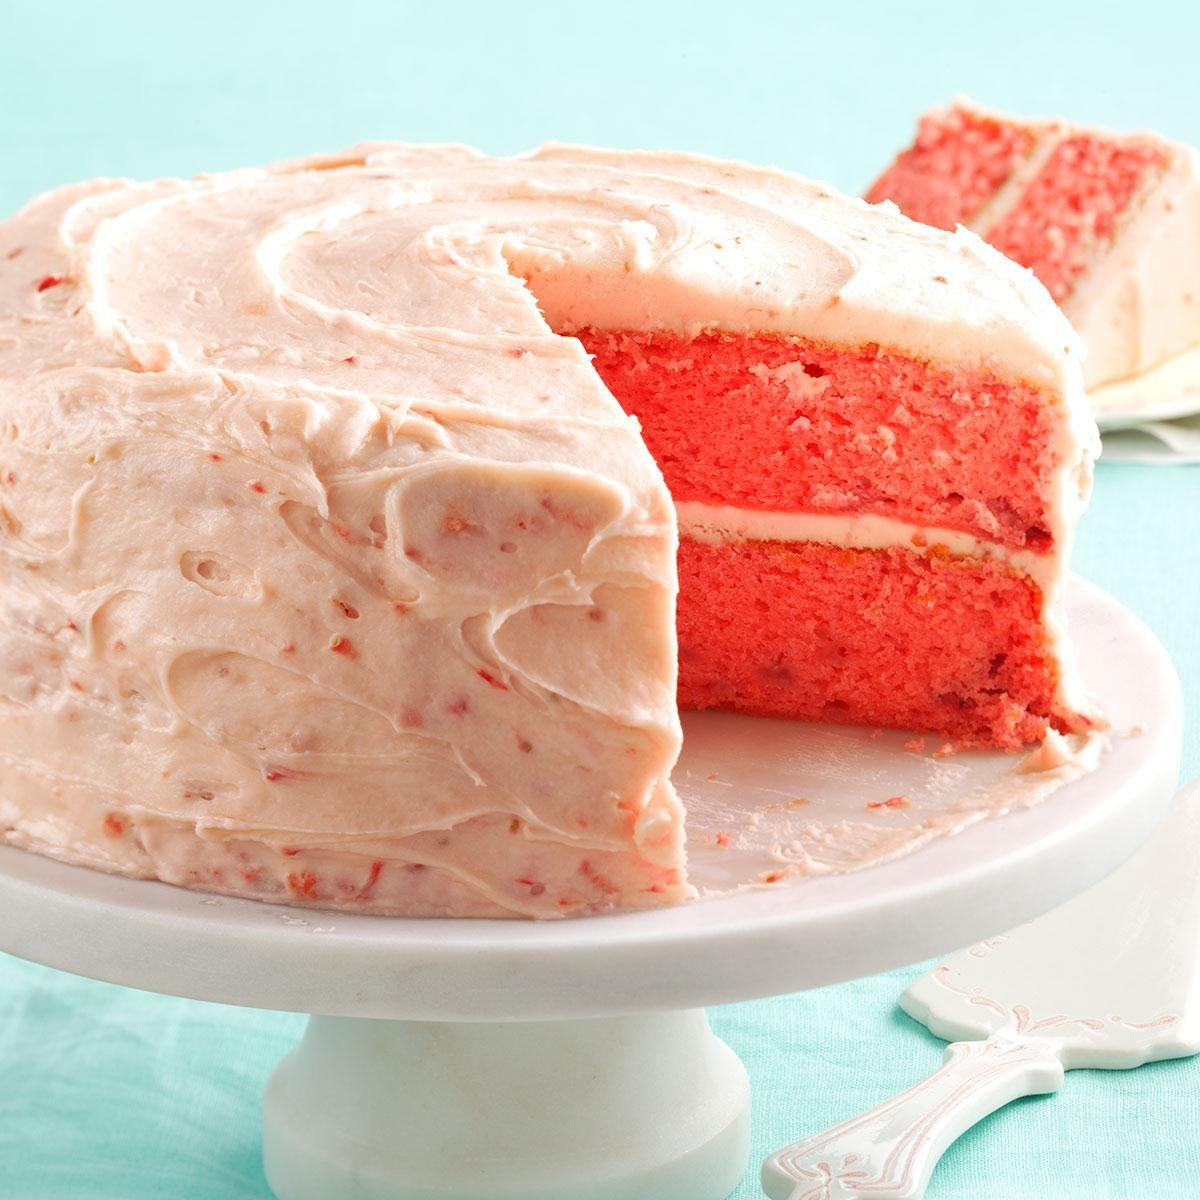 Homemade Strawberry Jello Cake